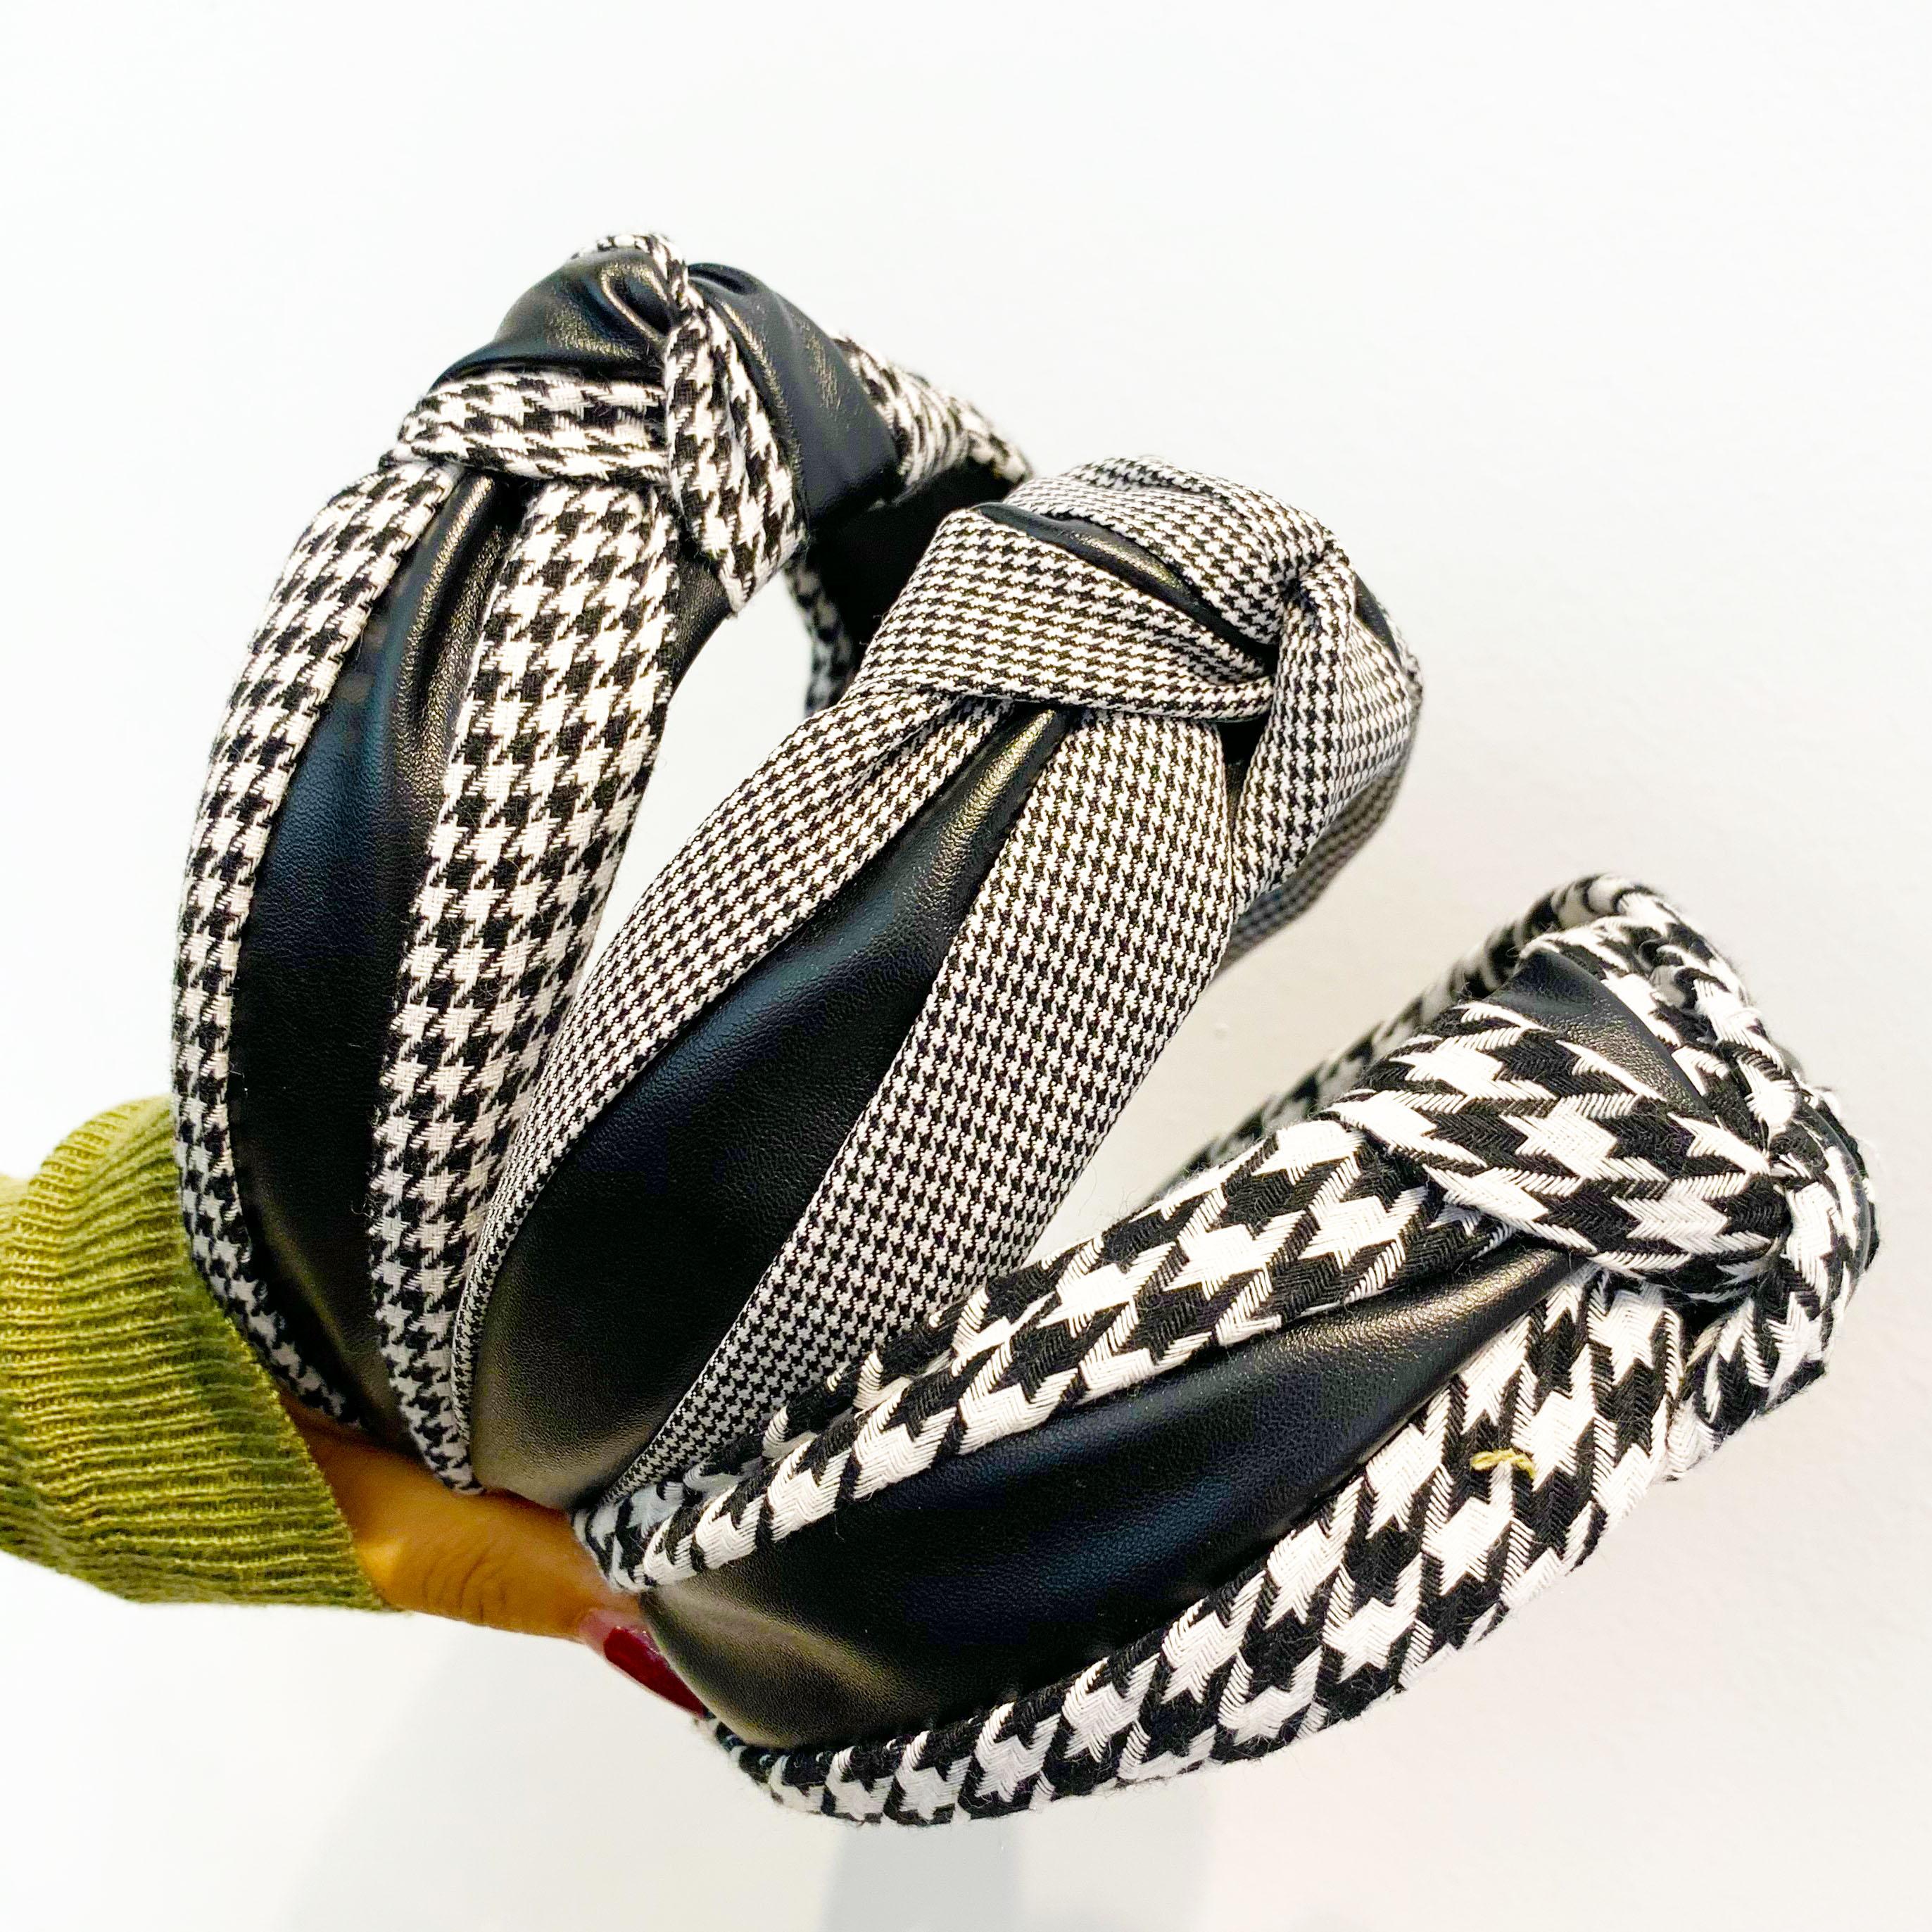 Chen Yan Fashion Knot Headband  Lady Print Headbands  New Plaid Hairband FG1914